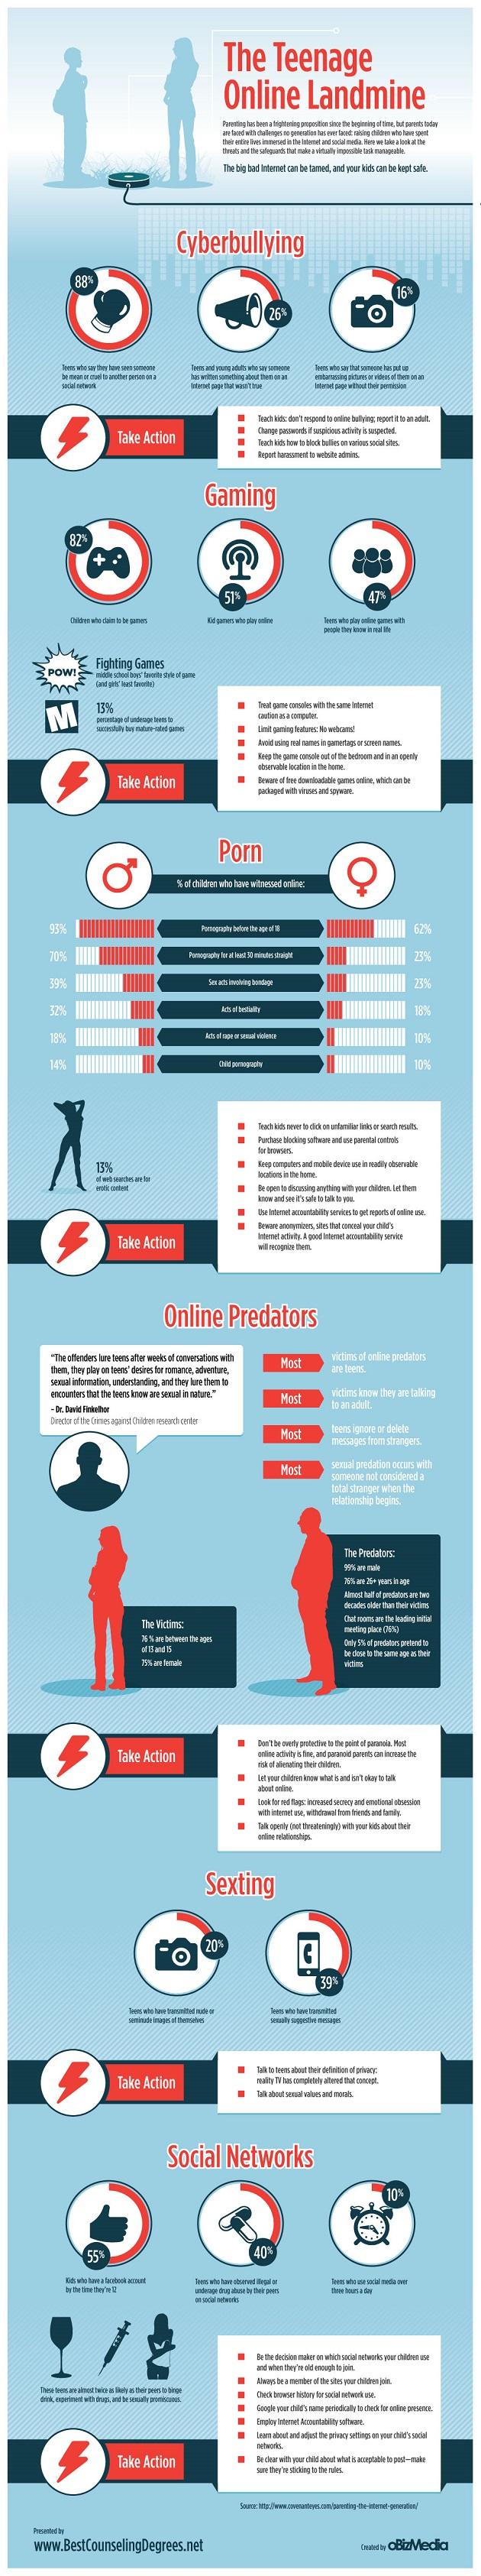 388869-infographic-the-teenage-online-landmine